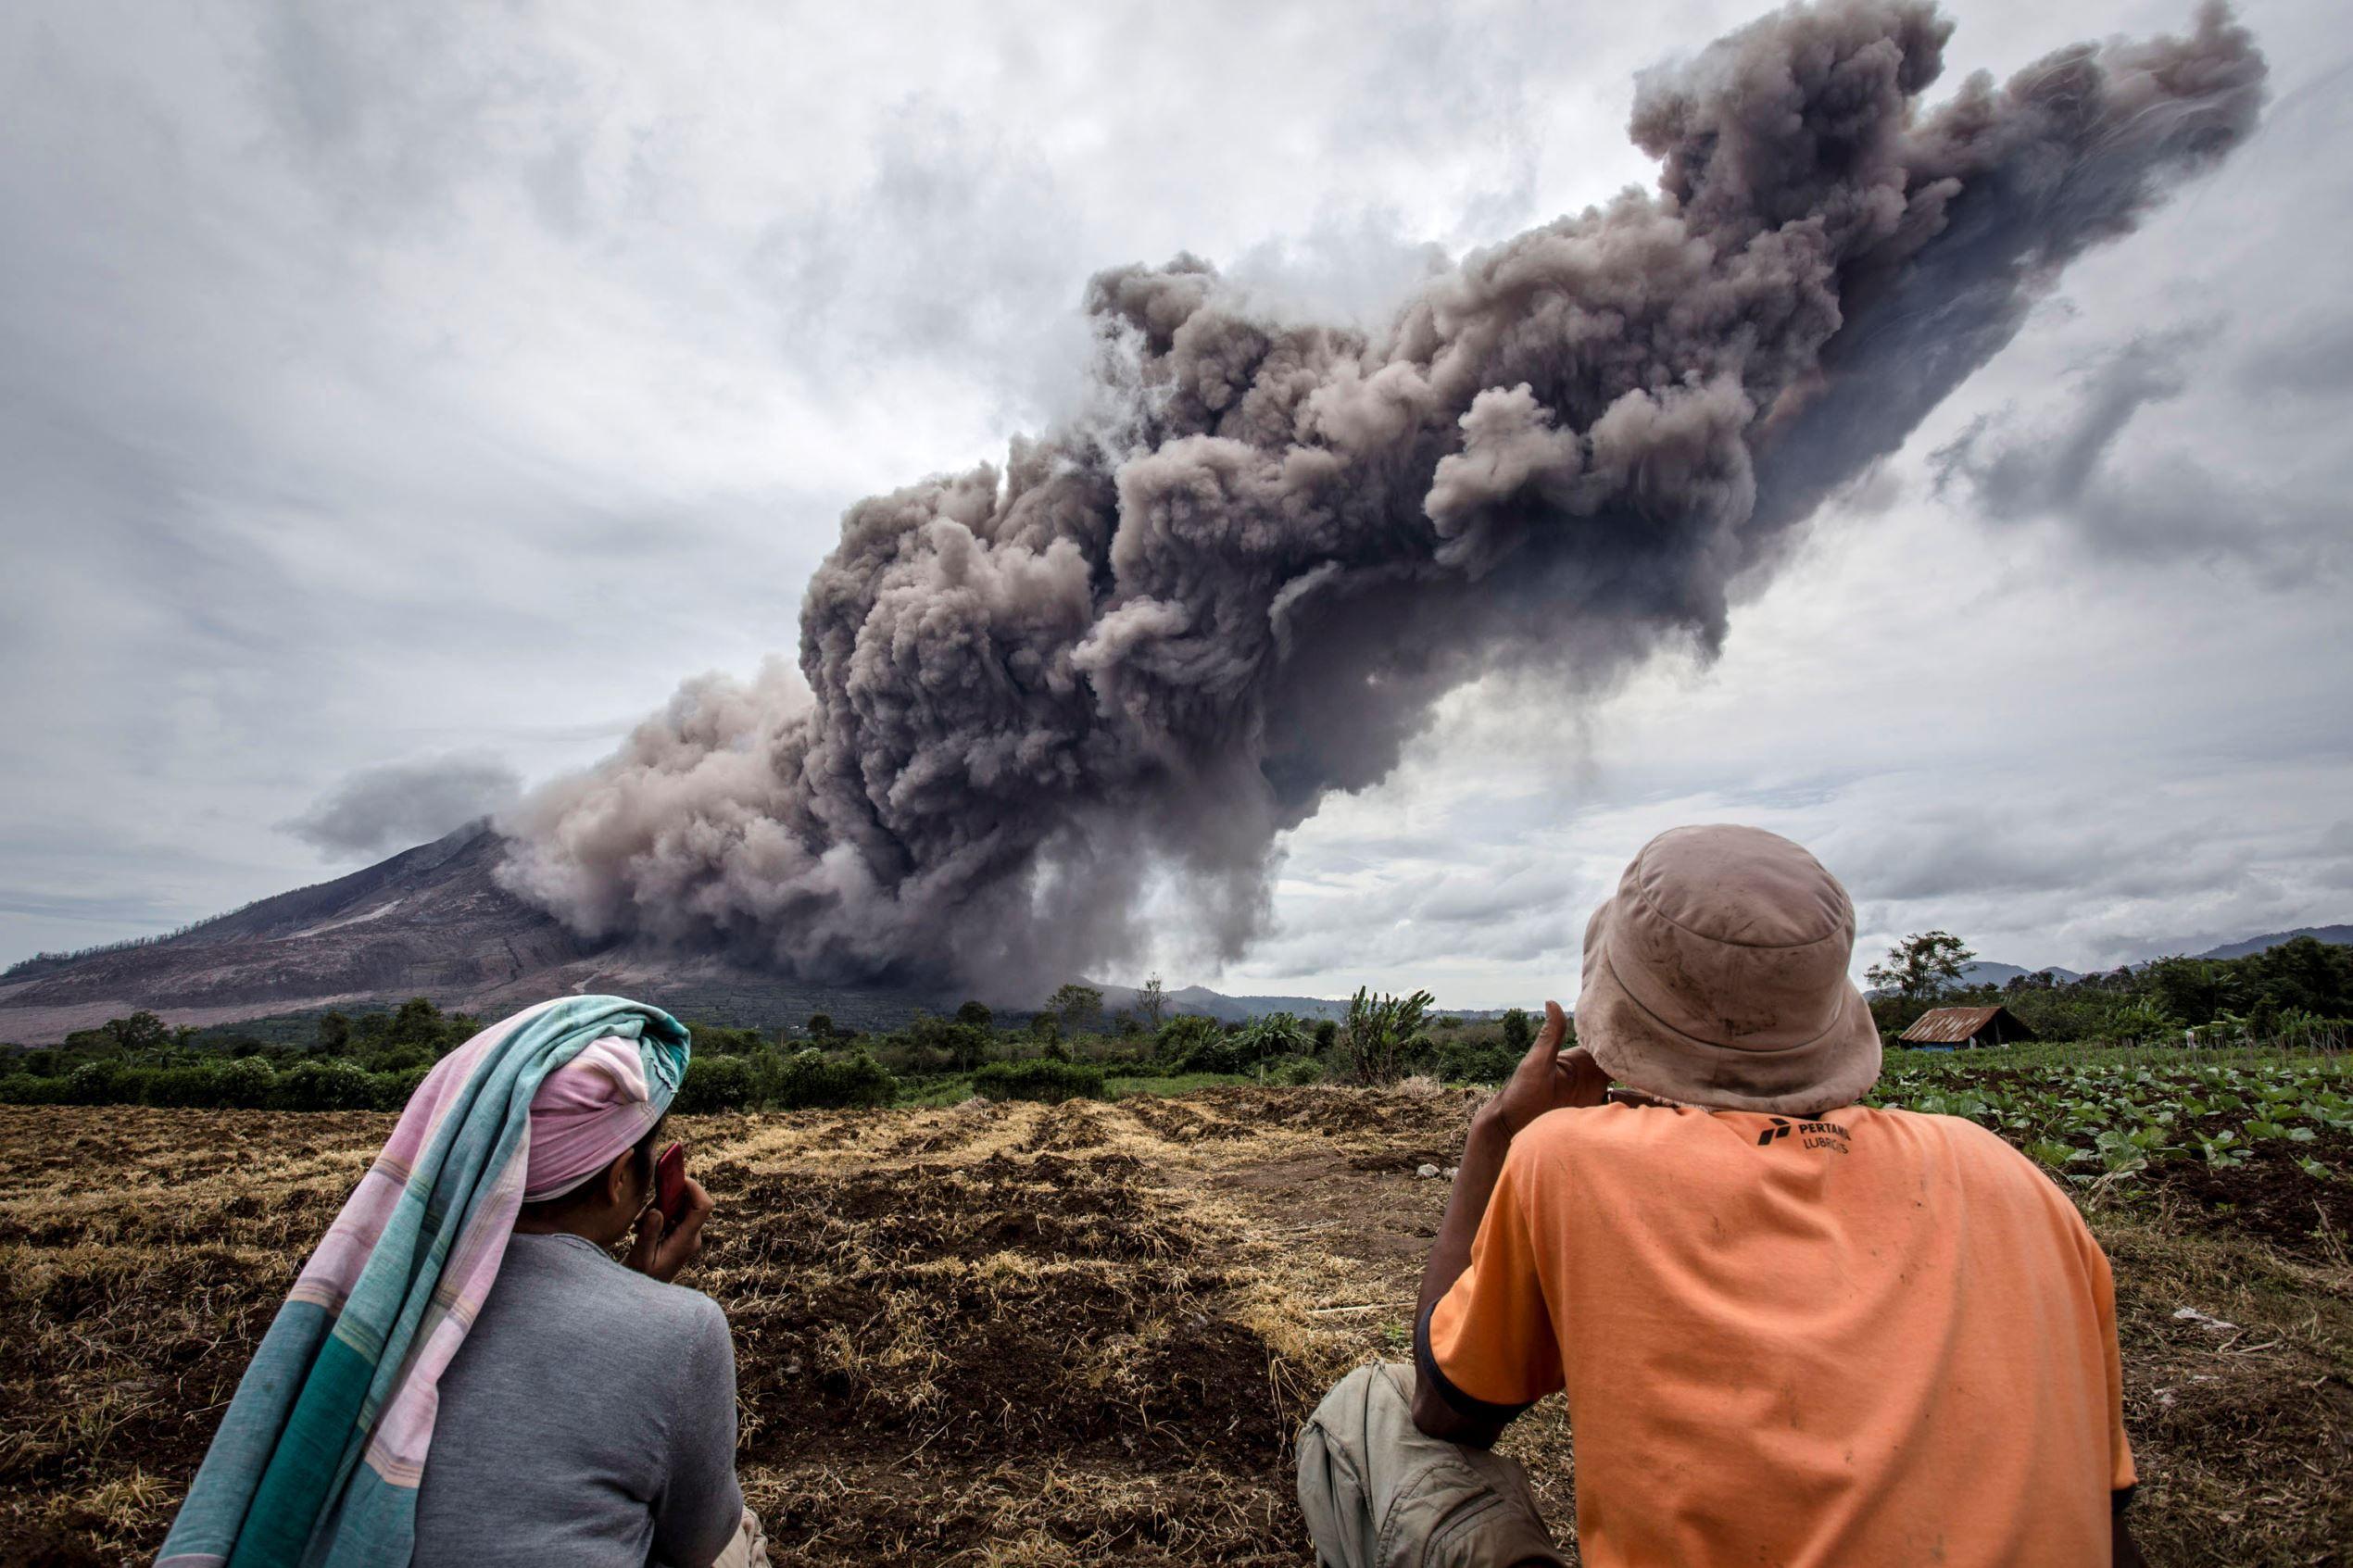 Sumatra, Indonesia Farmers in Tiga Kicat village look on